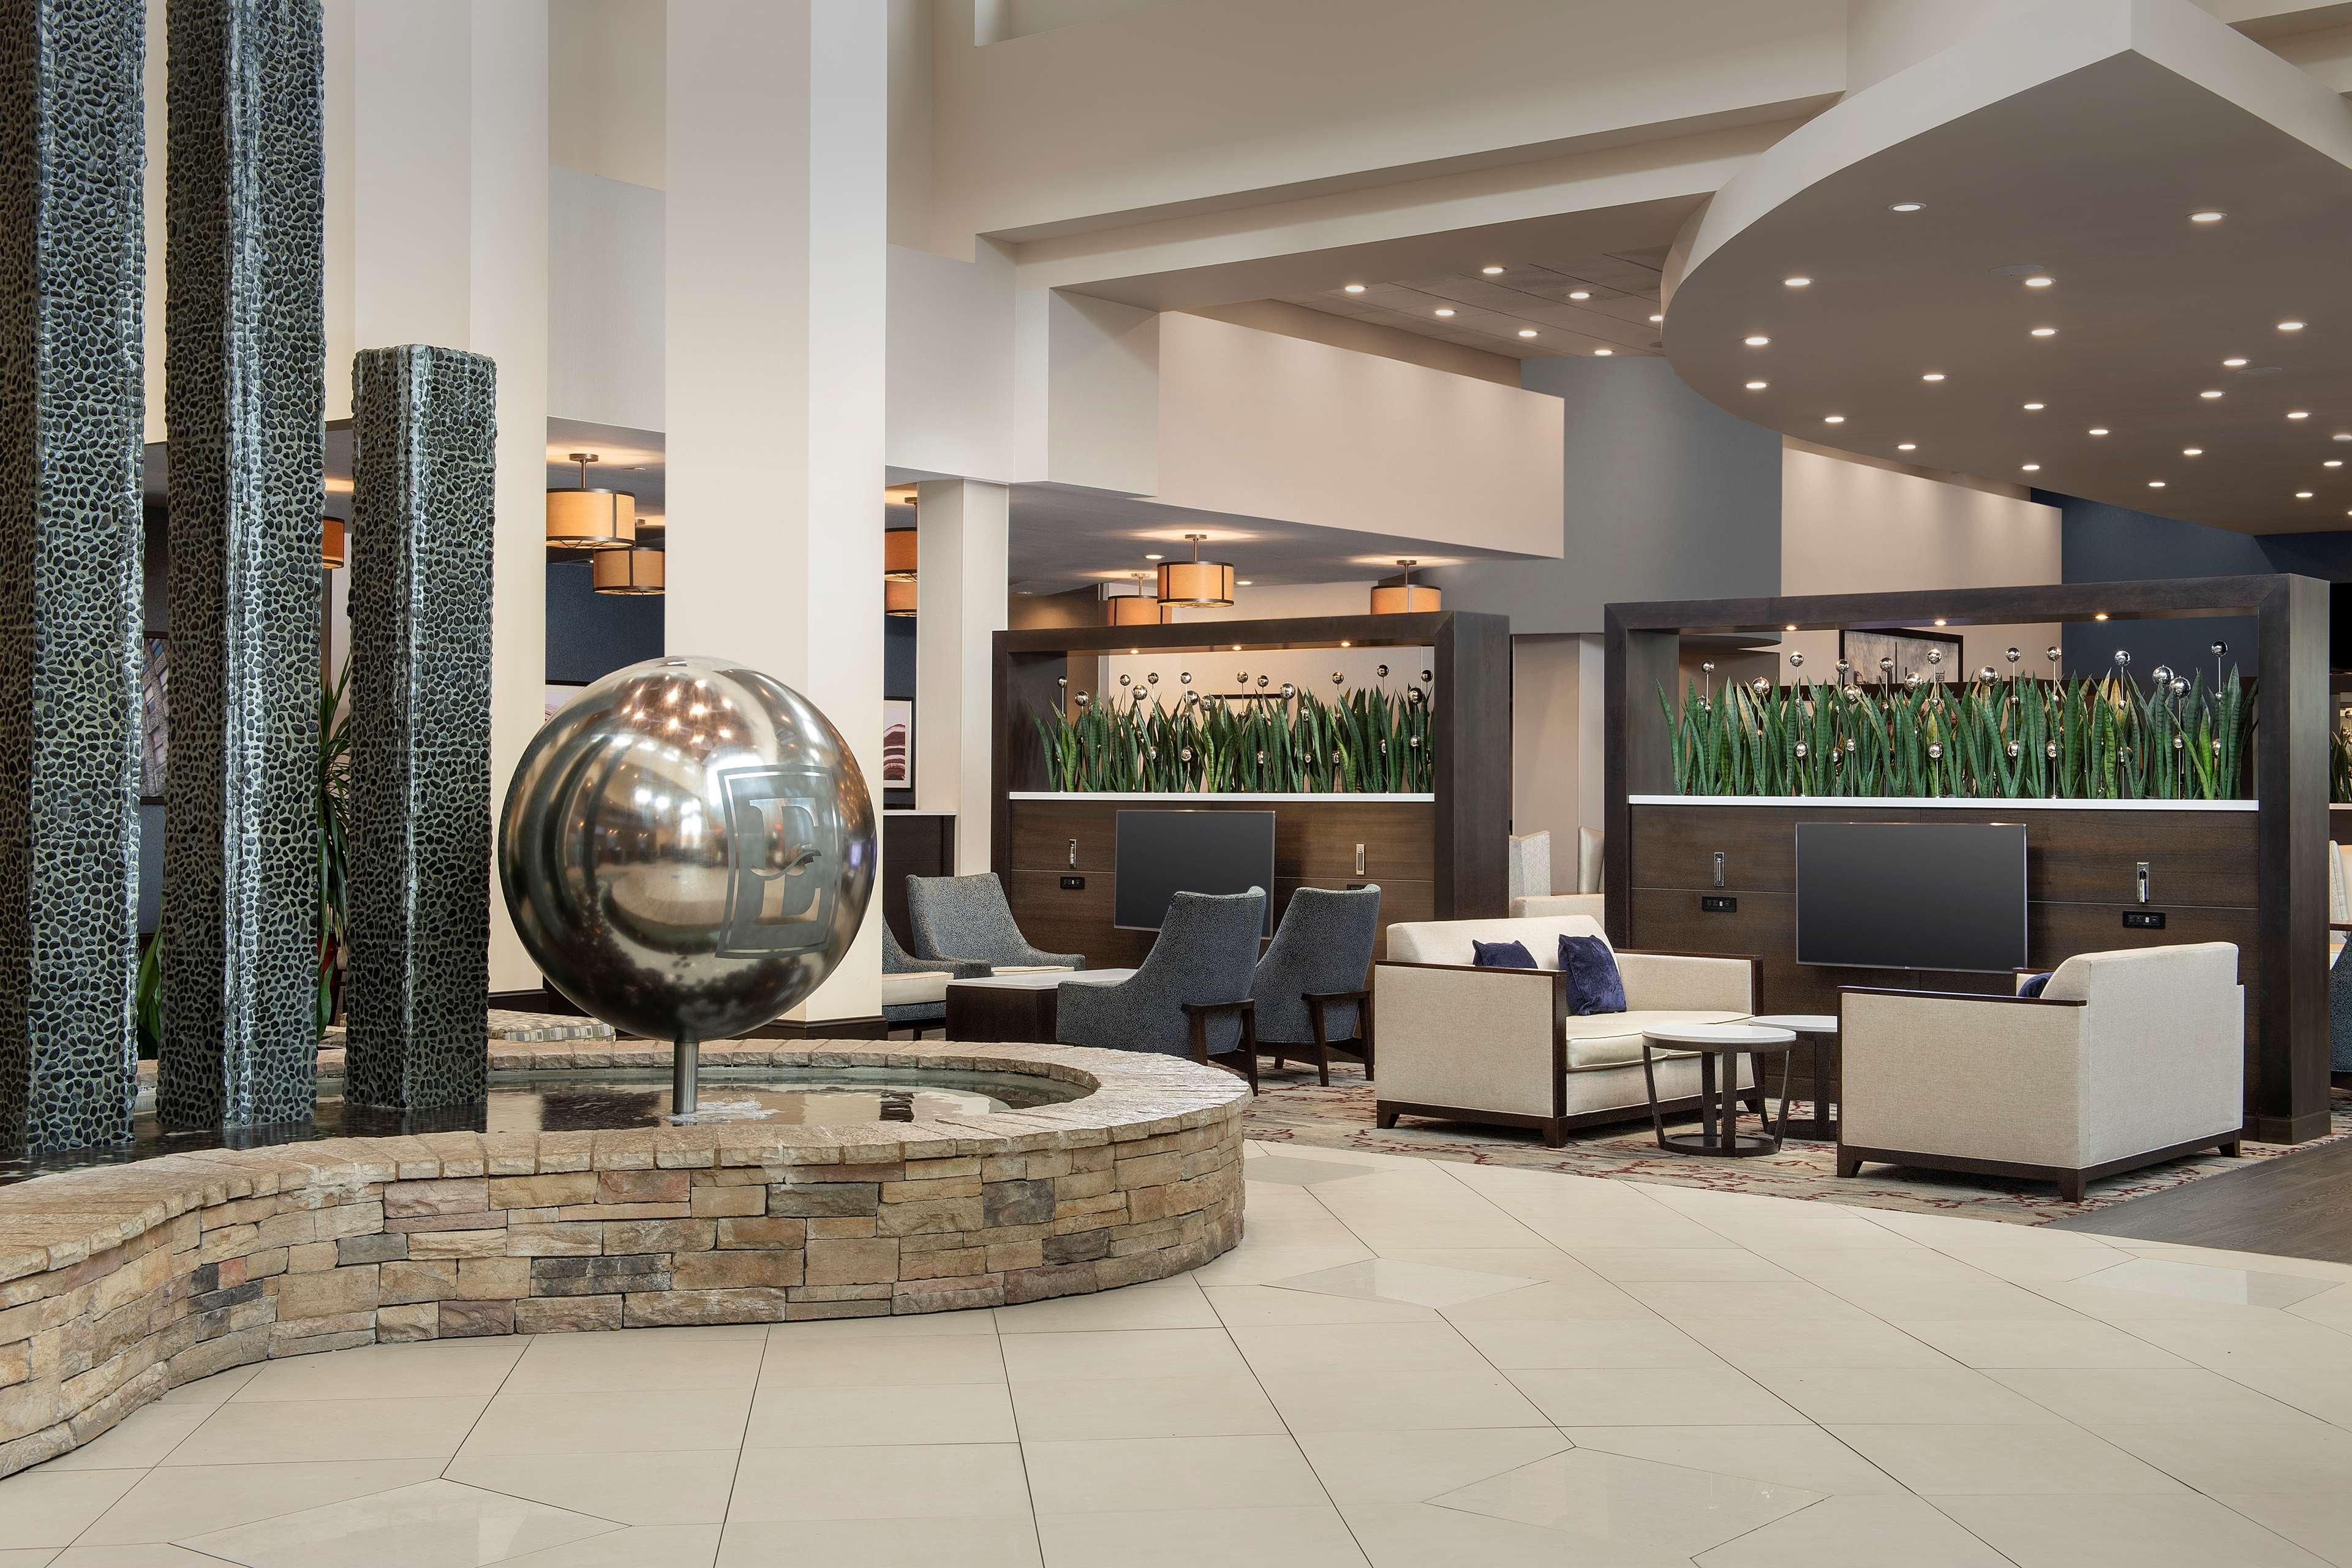 Embassy Suites by Hilton Birmingham Hoover